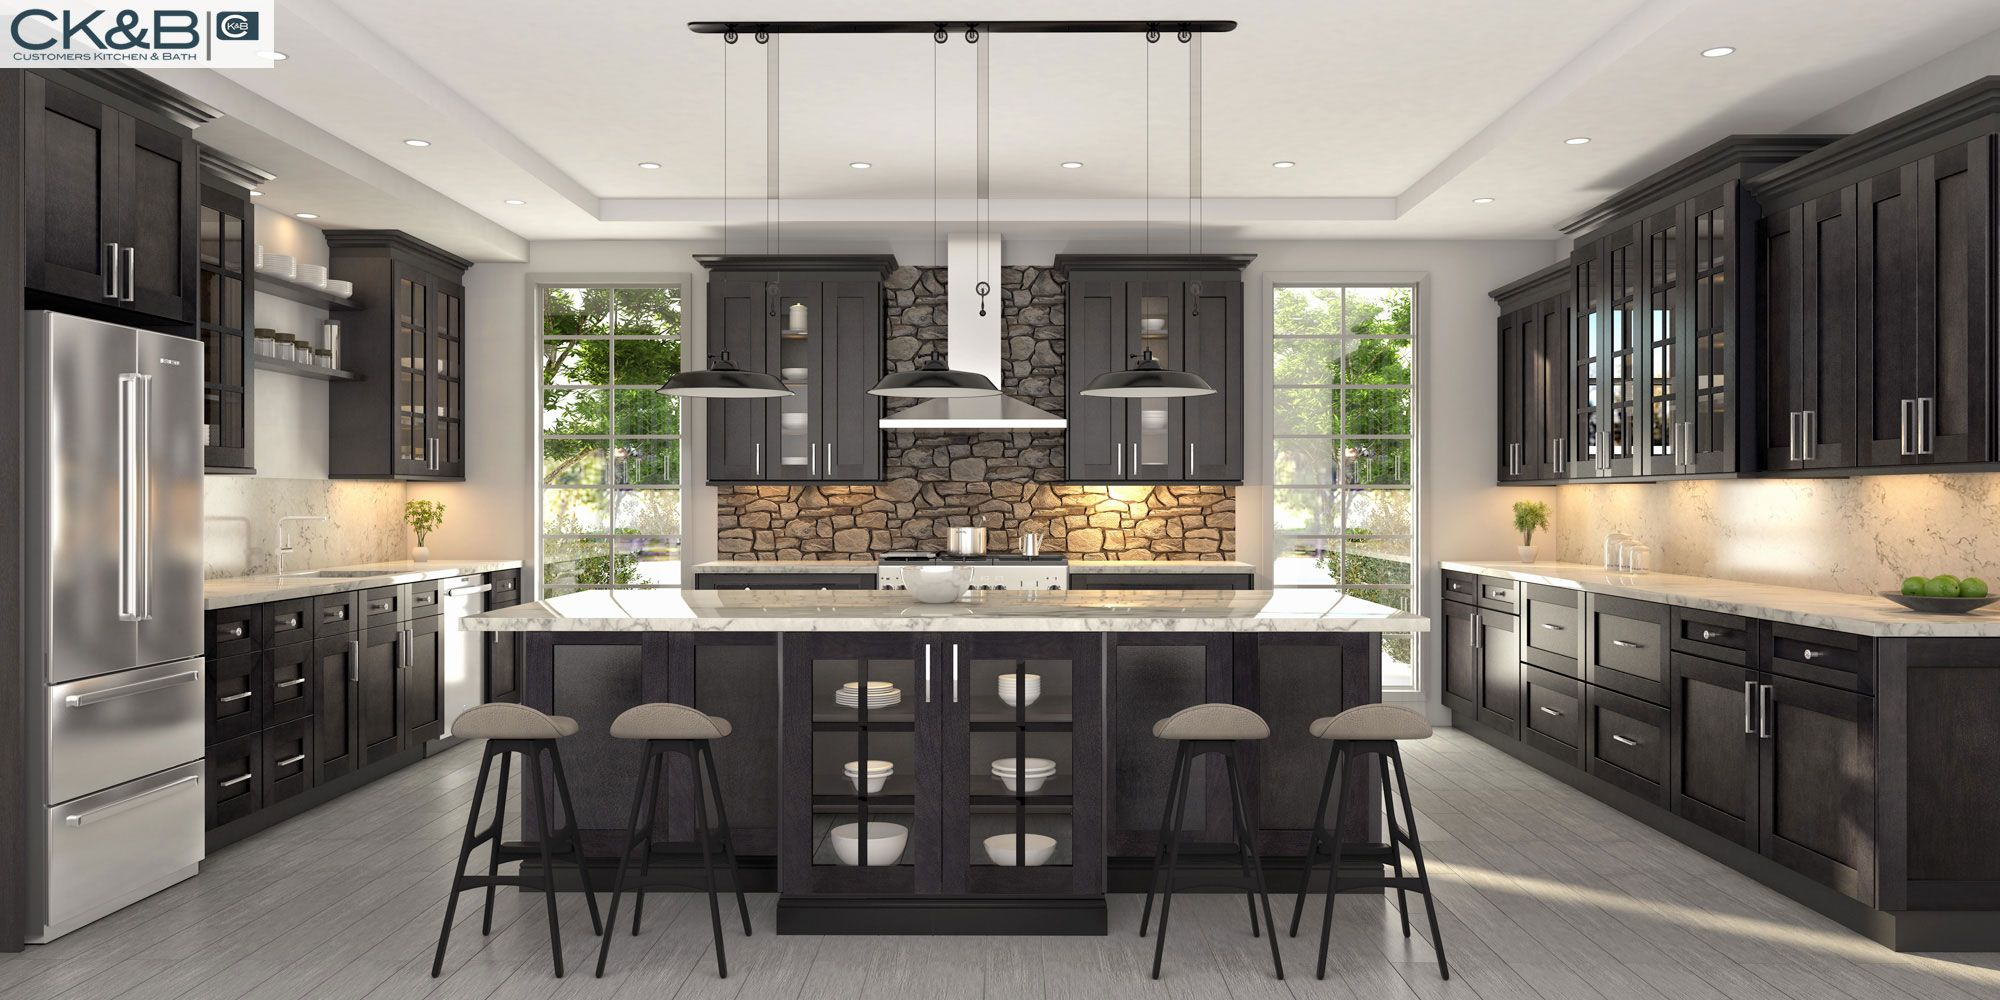 Family #Kitchen Design #Cambriausa #kitchen #remodel # ...